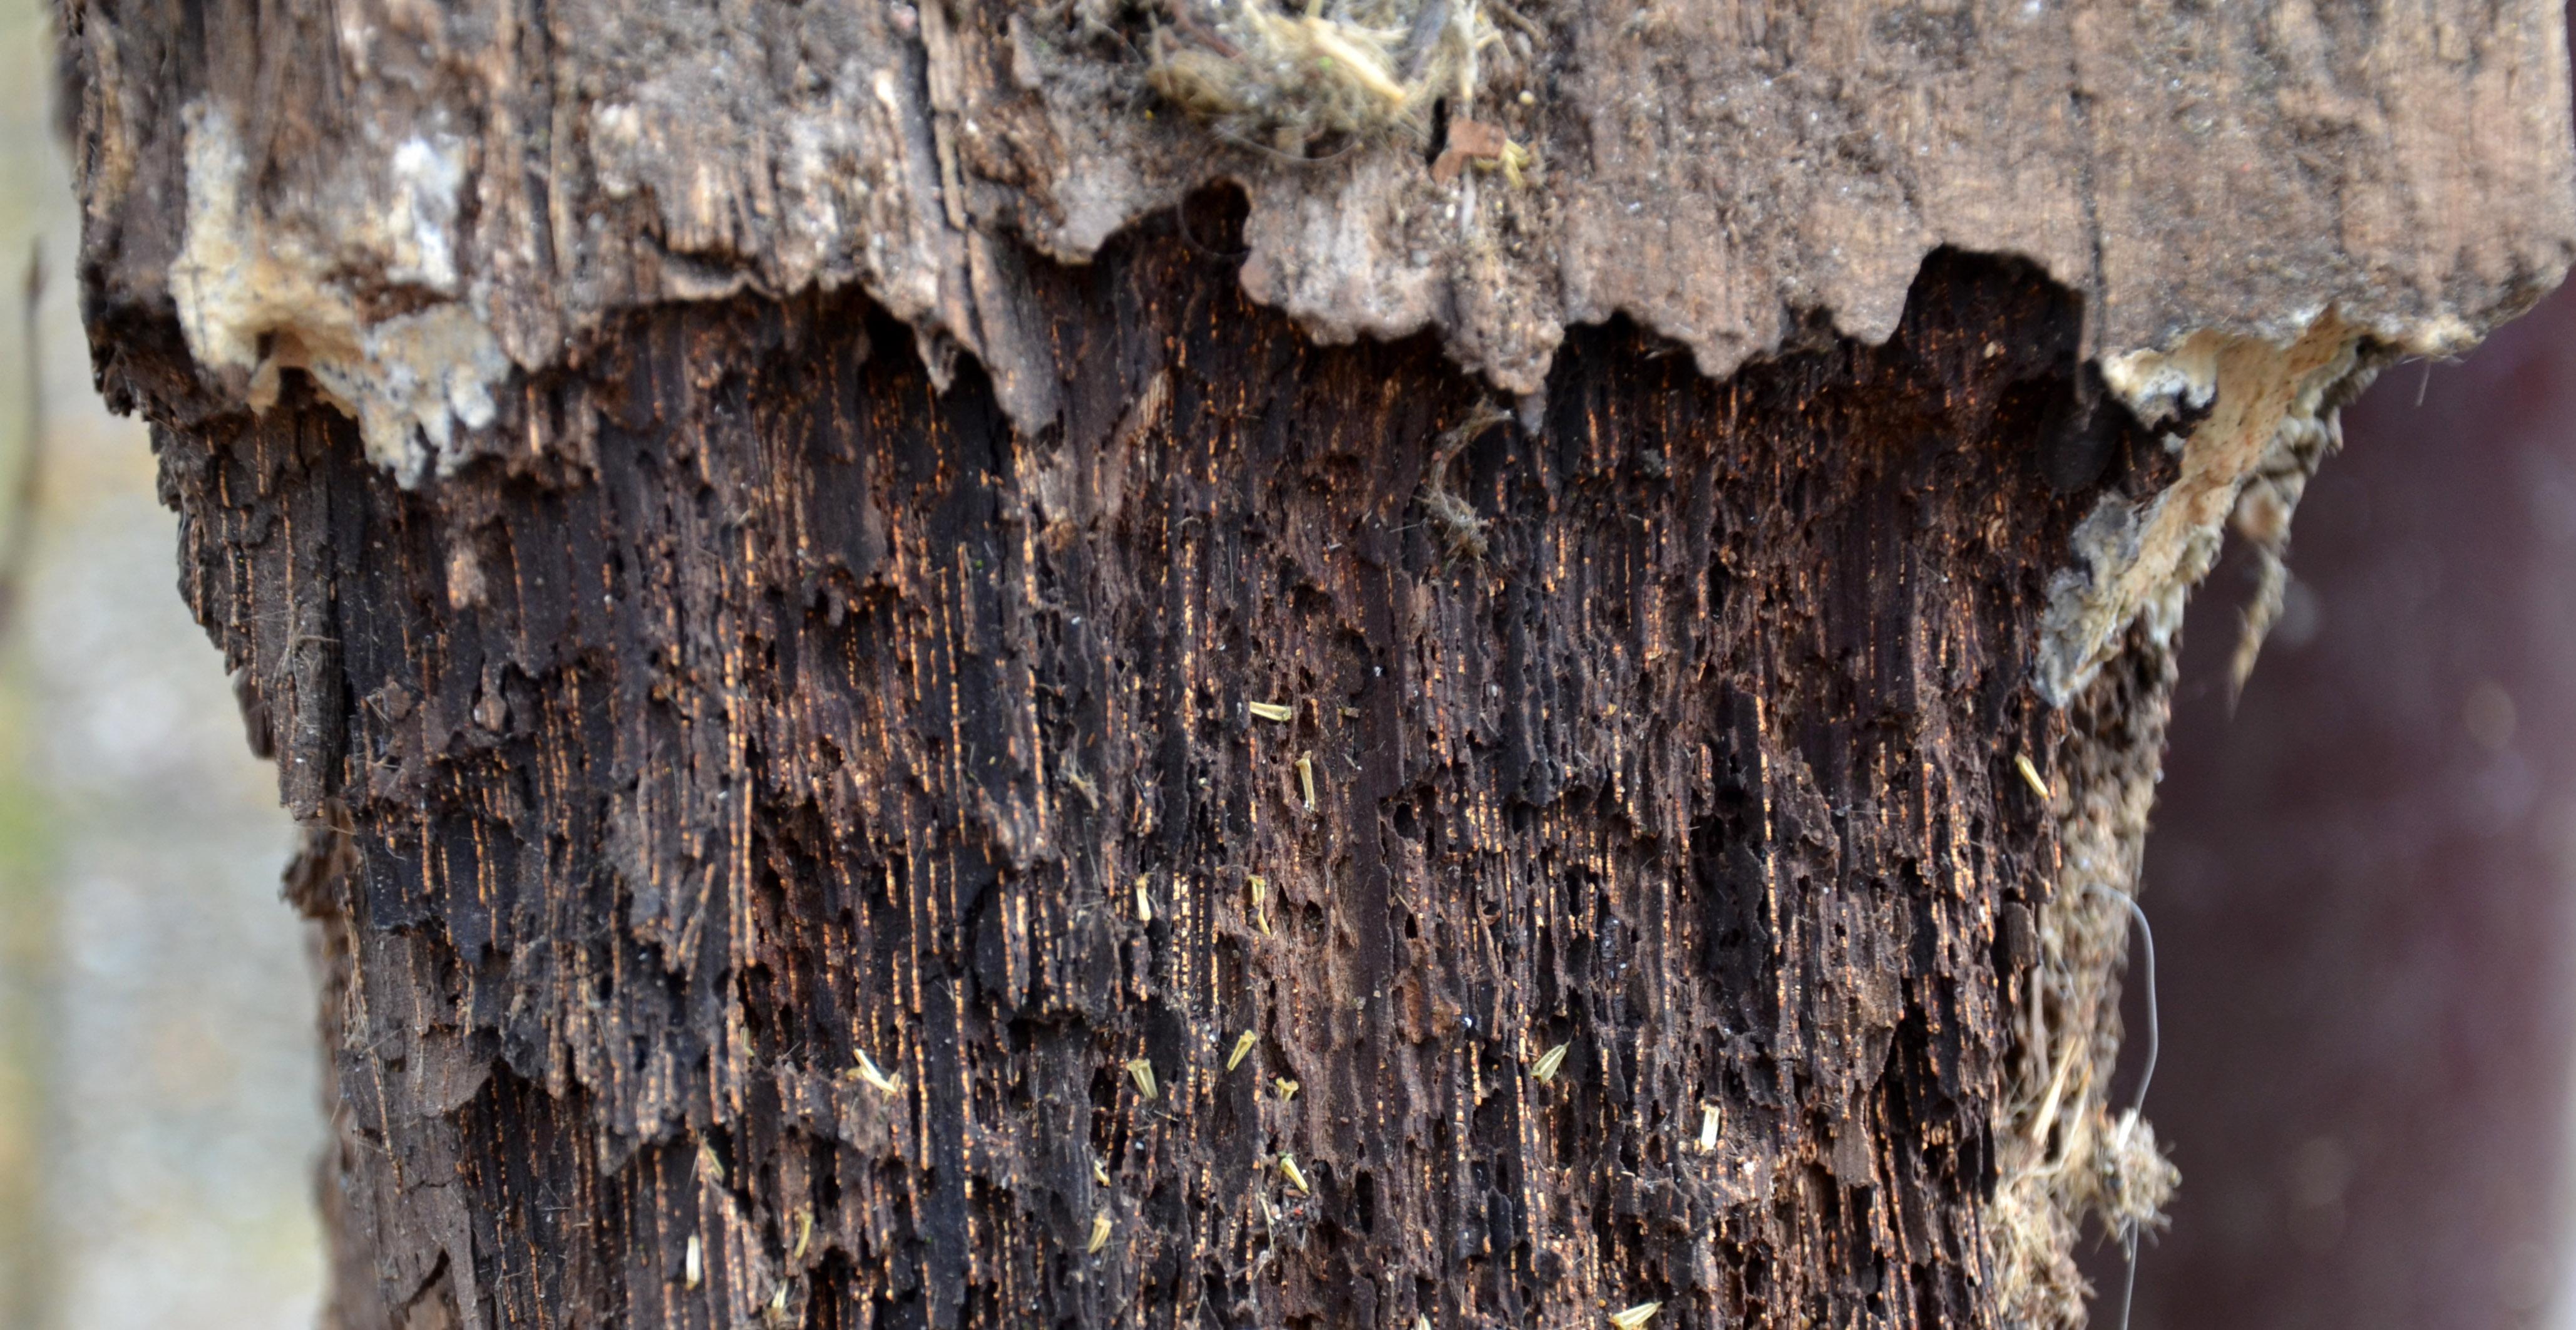 Cutting Pressure Treated Wood Indoors